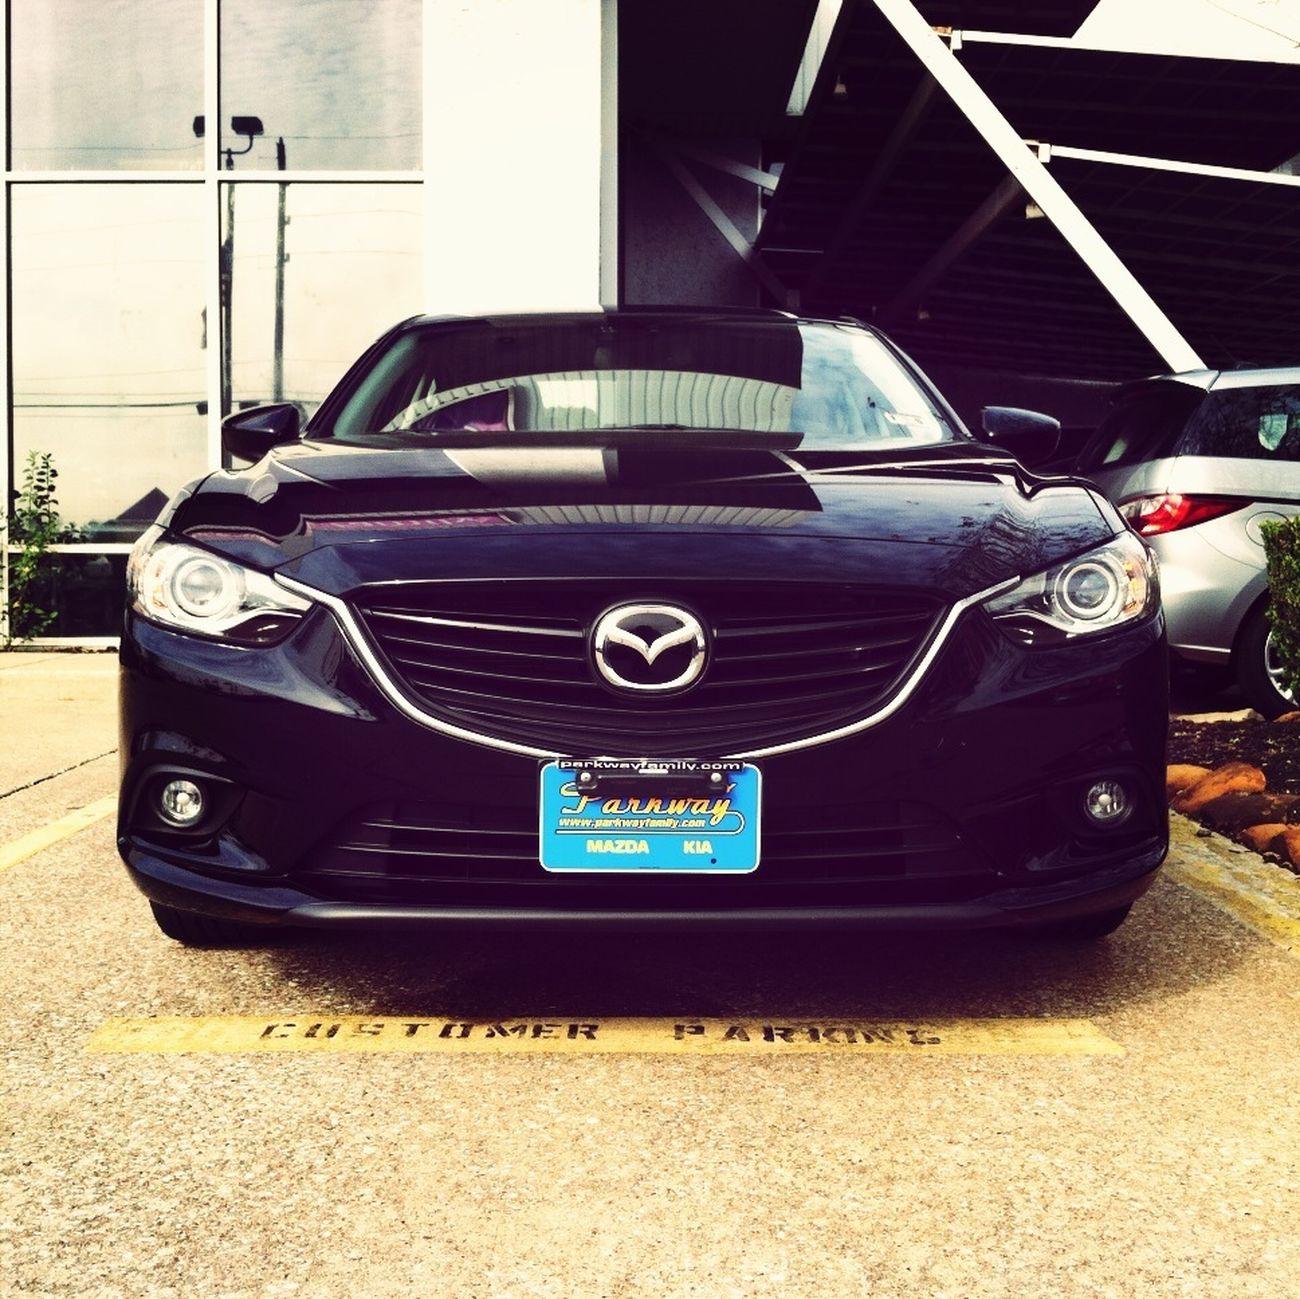 The brilliant and efficient 2014 Mazda 6 Grand Touring at Parkway Family Mazda! #mazda #mazda6 #parkwayfamilymazda